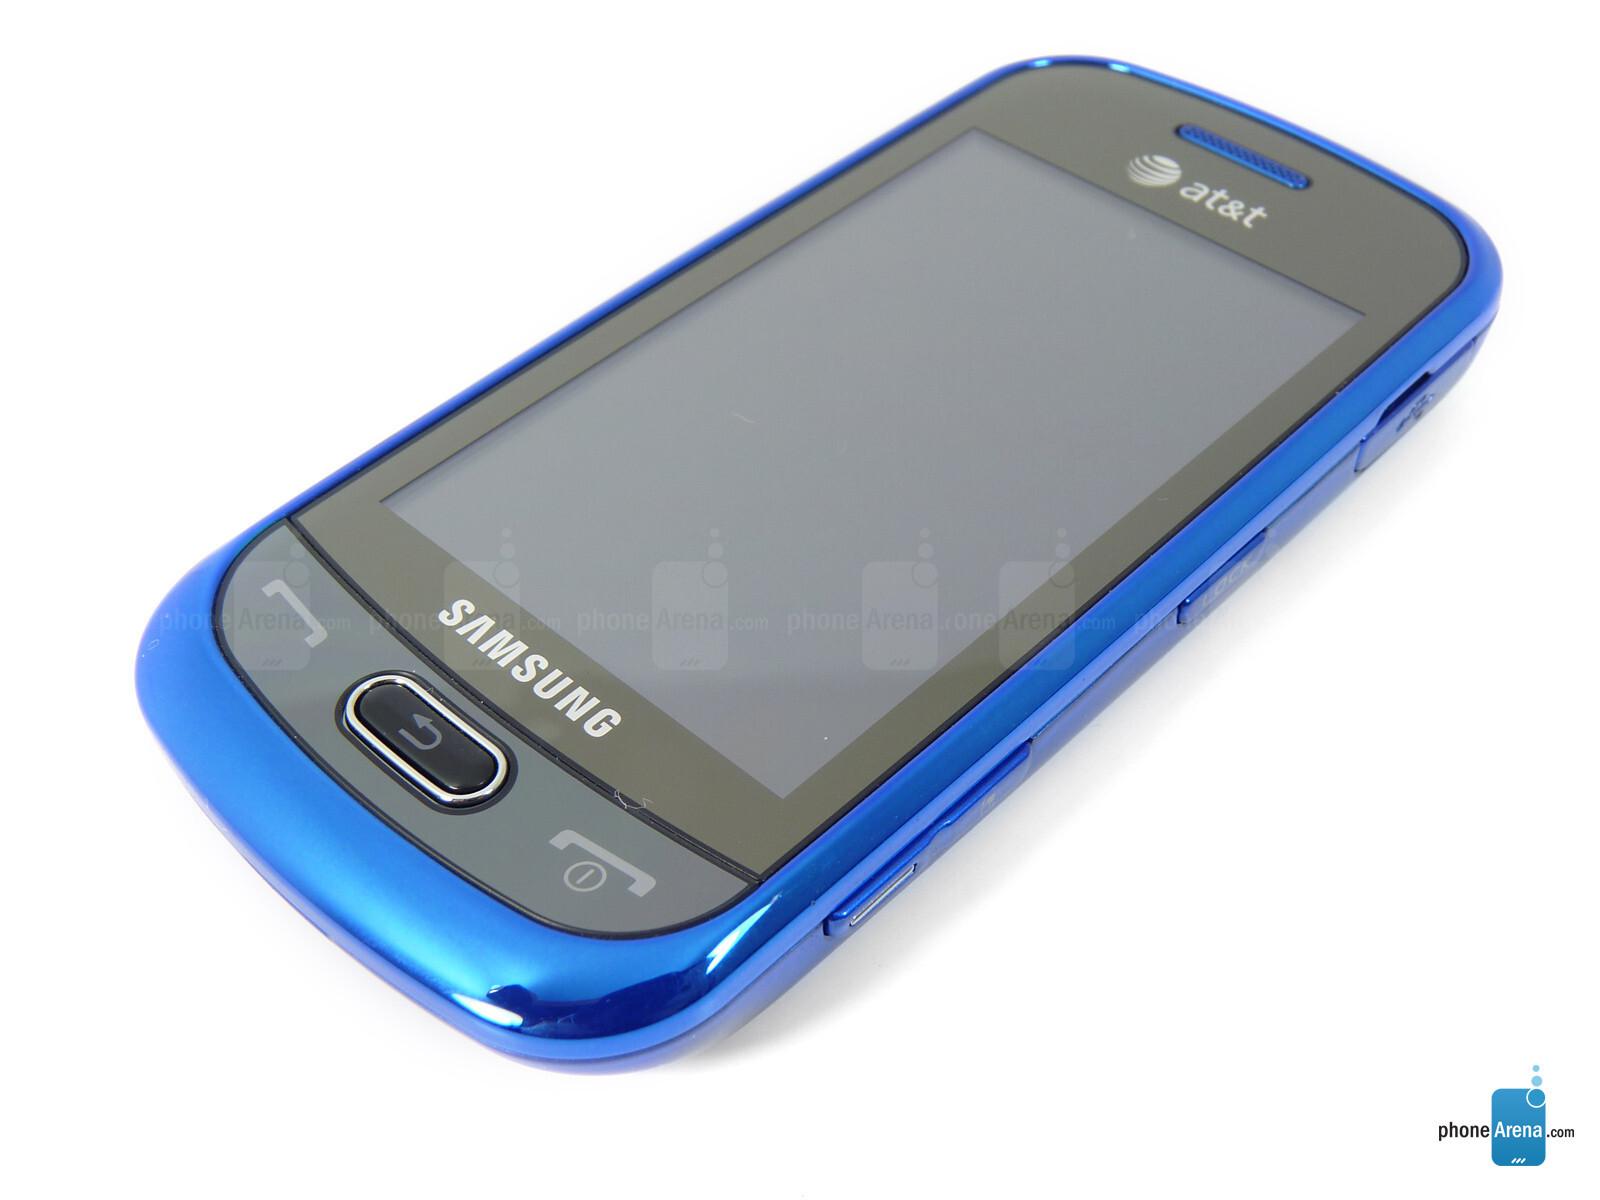 samsung eternity ii photos rh phonearena com Samsung Eternity A867 Eternity II A597